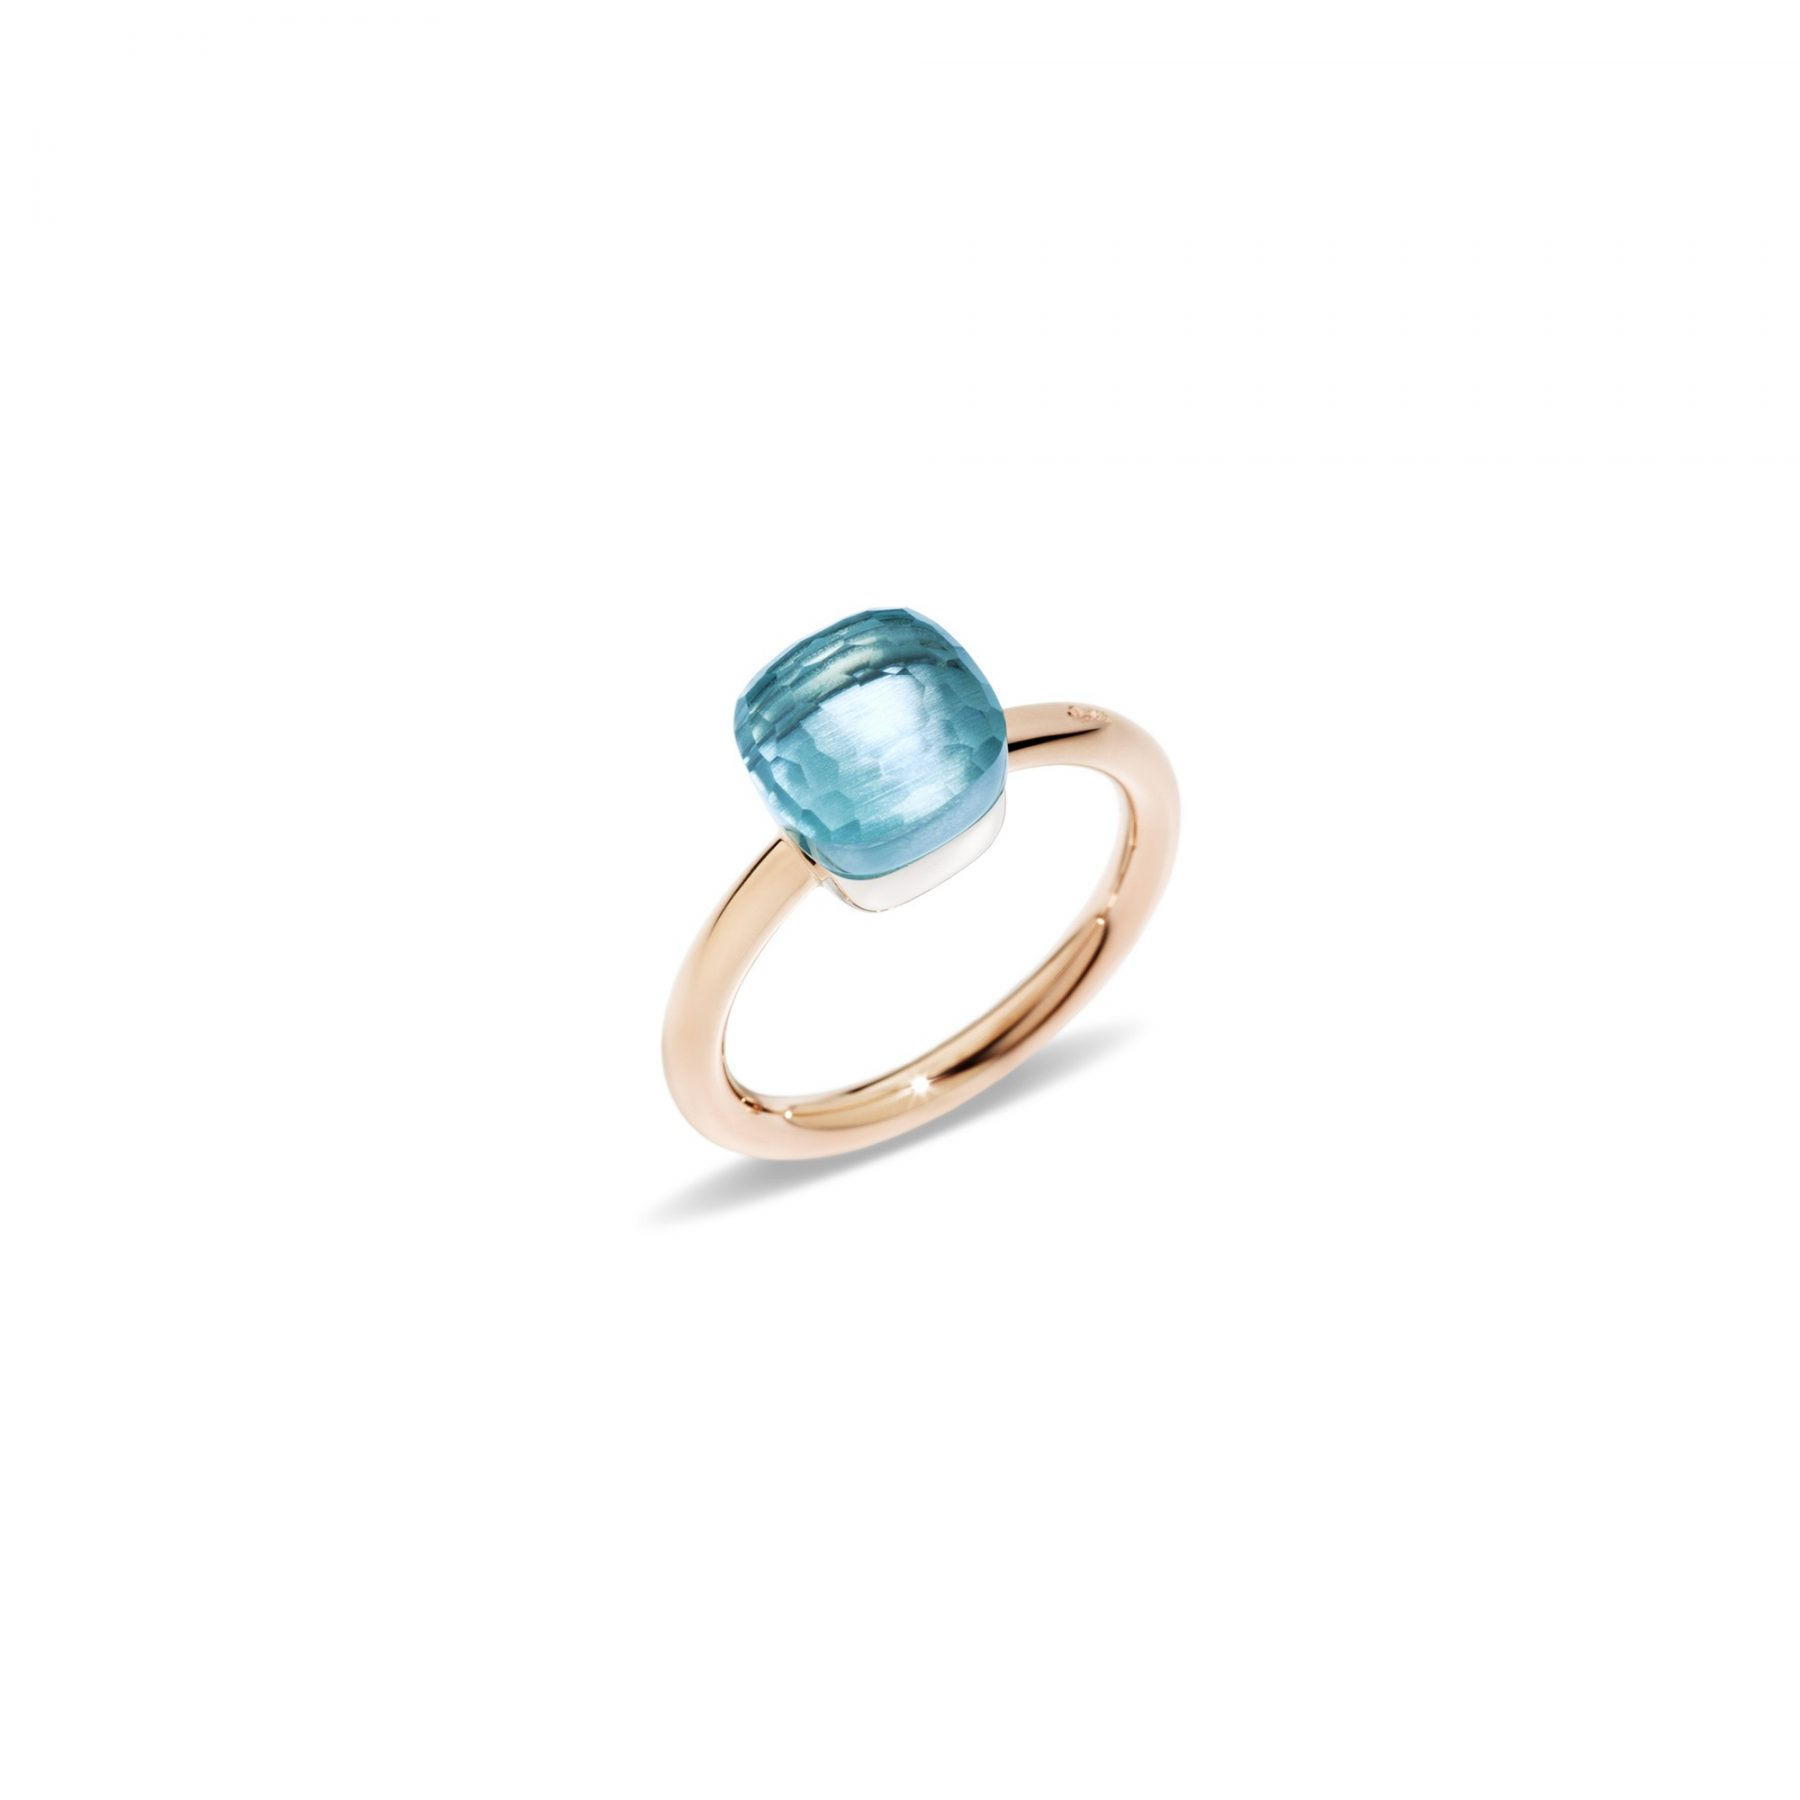 Ring Nudo Petit blauer Topas - Pomellato - A.B403/O6/OY